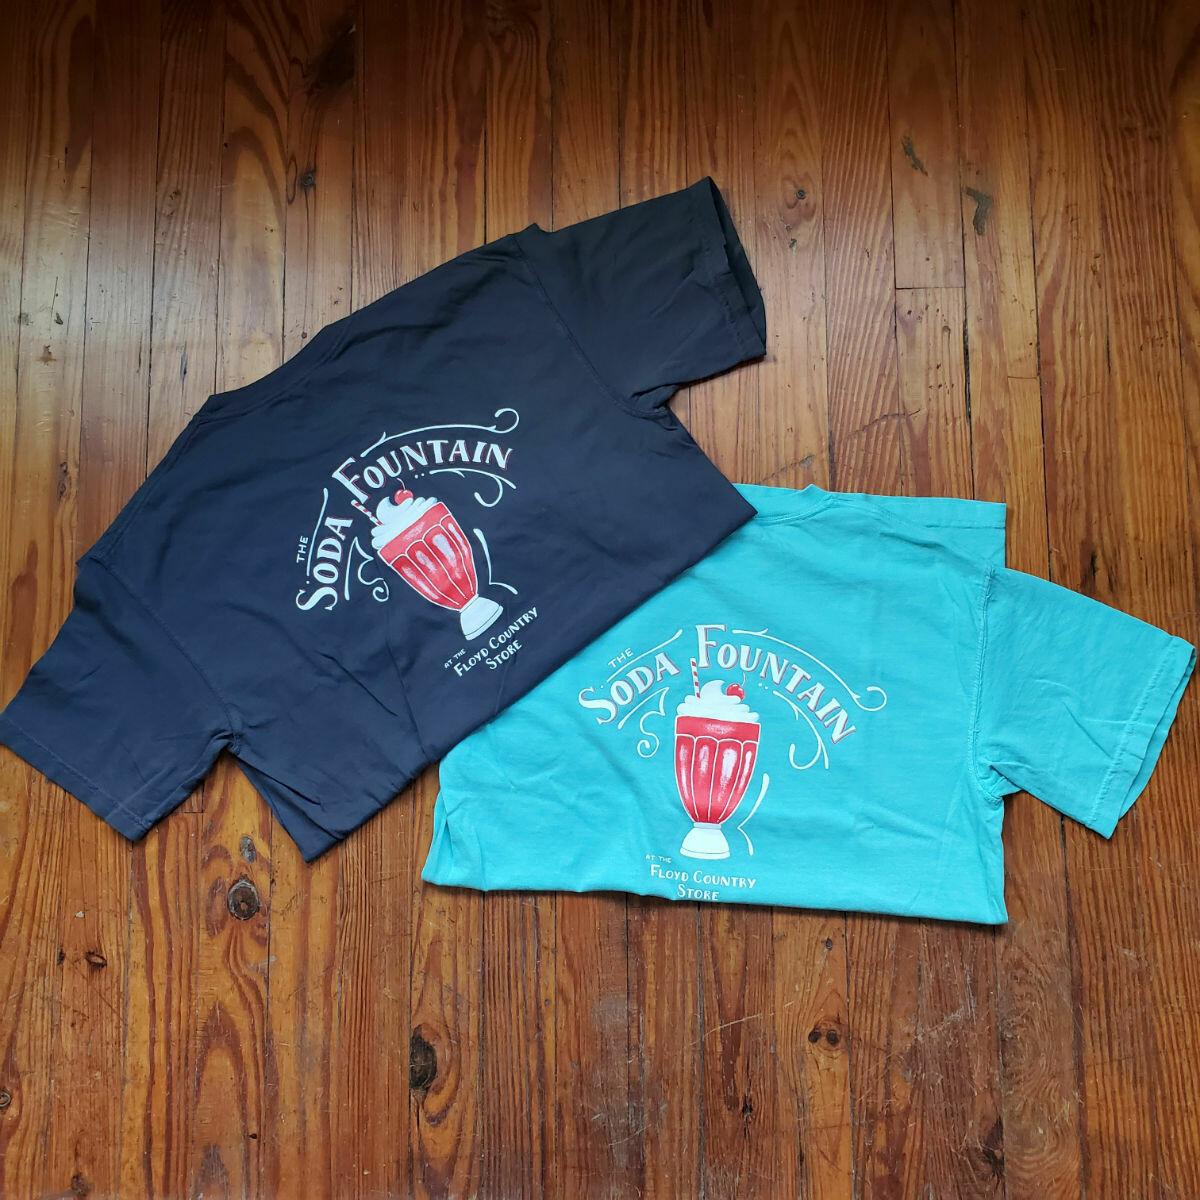 Soda Fountain Short Sleeve T-Shirt